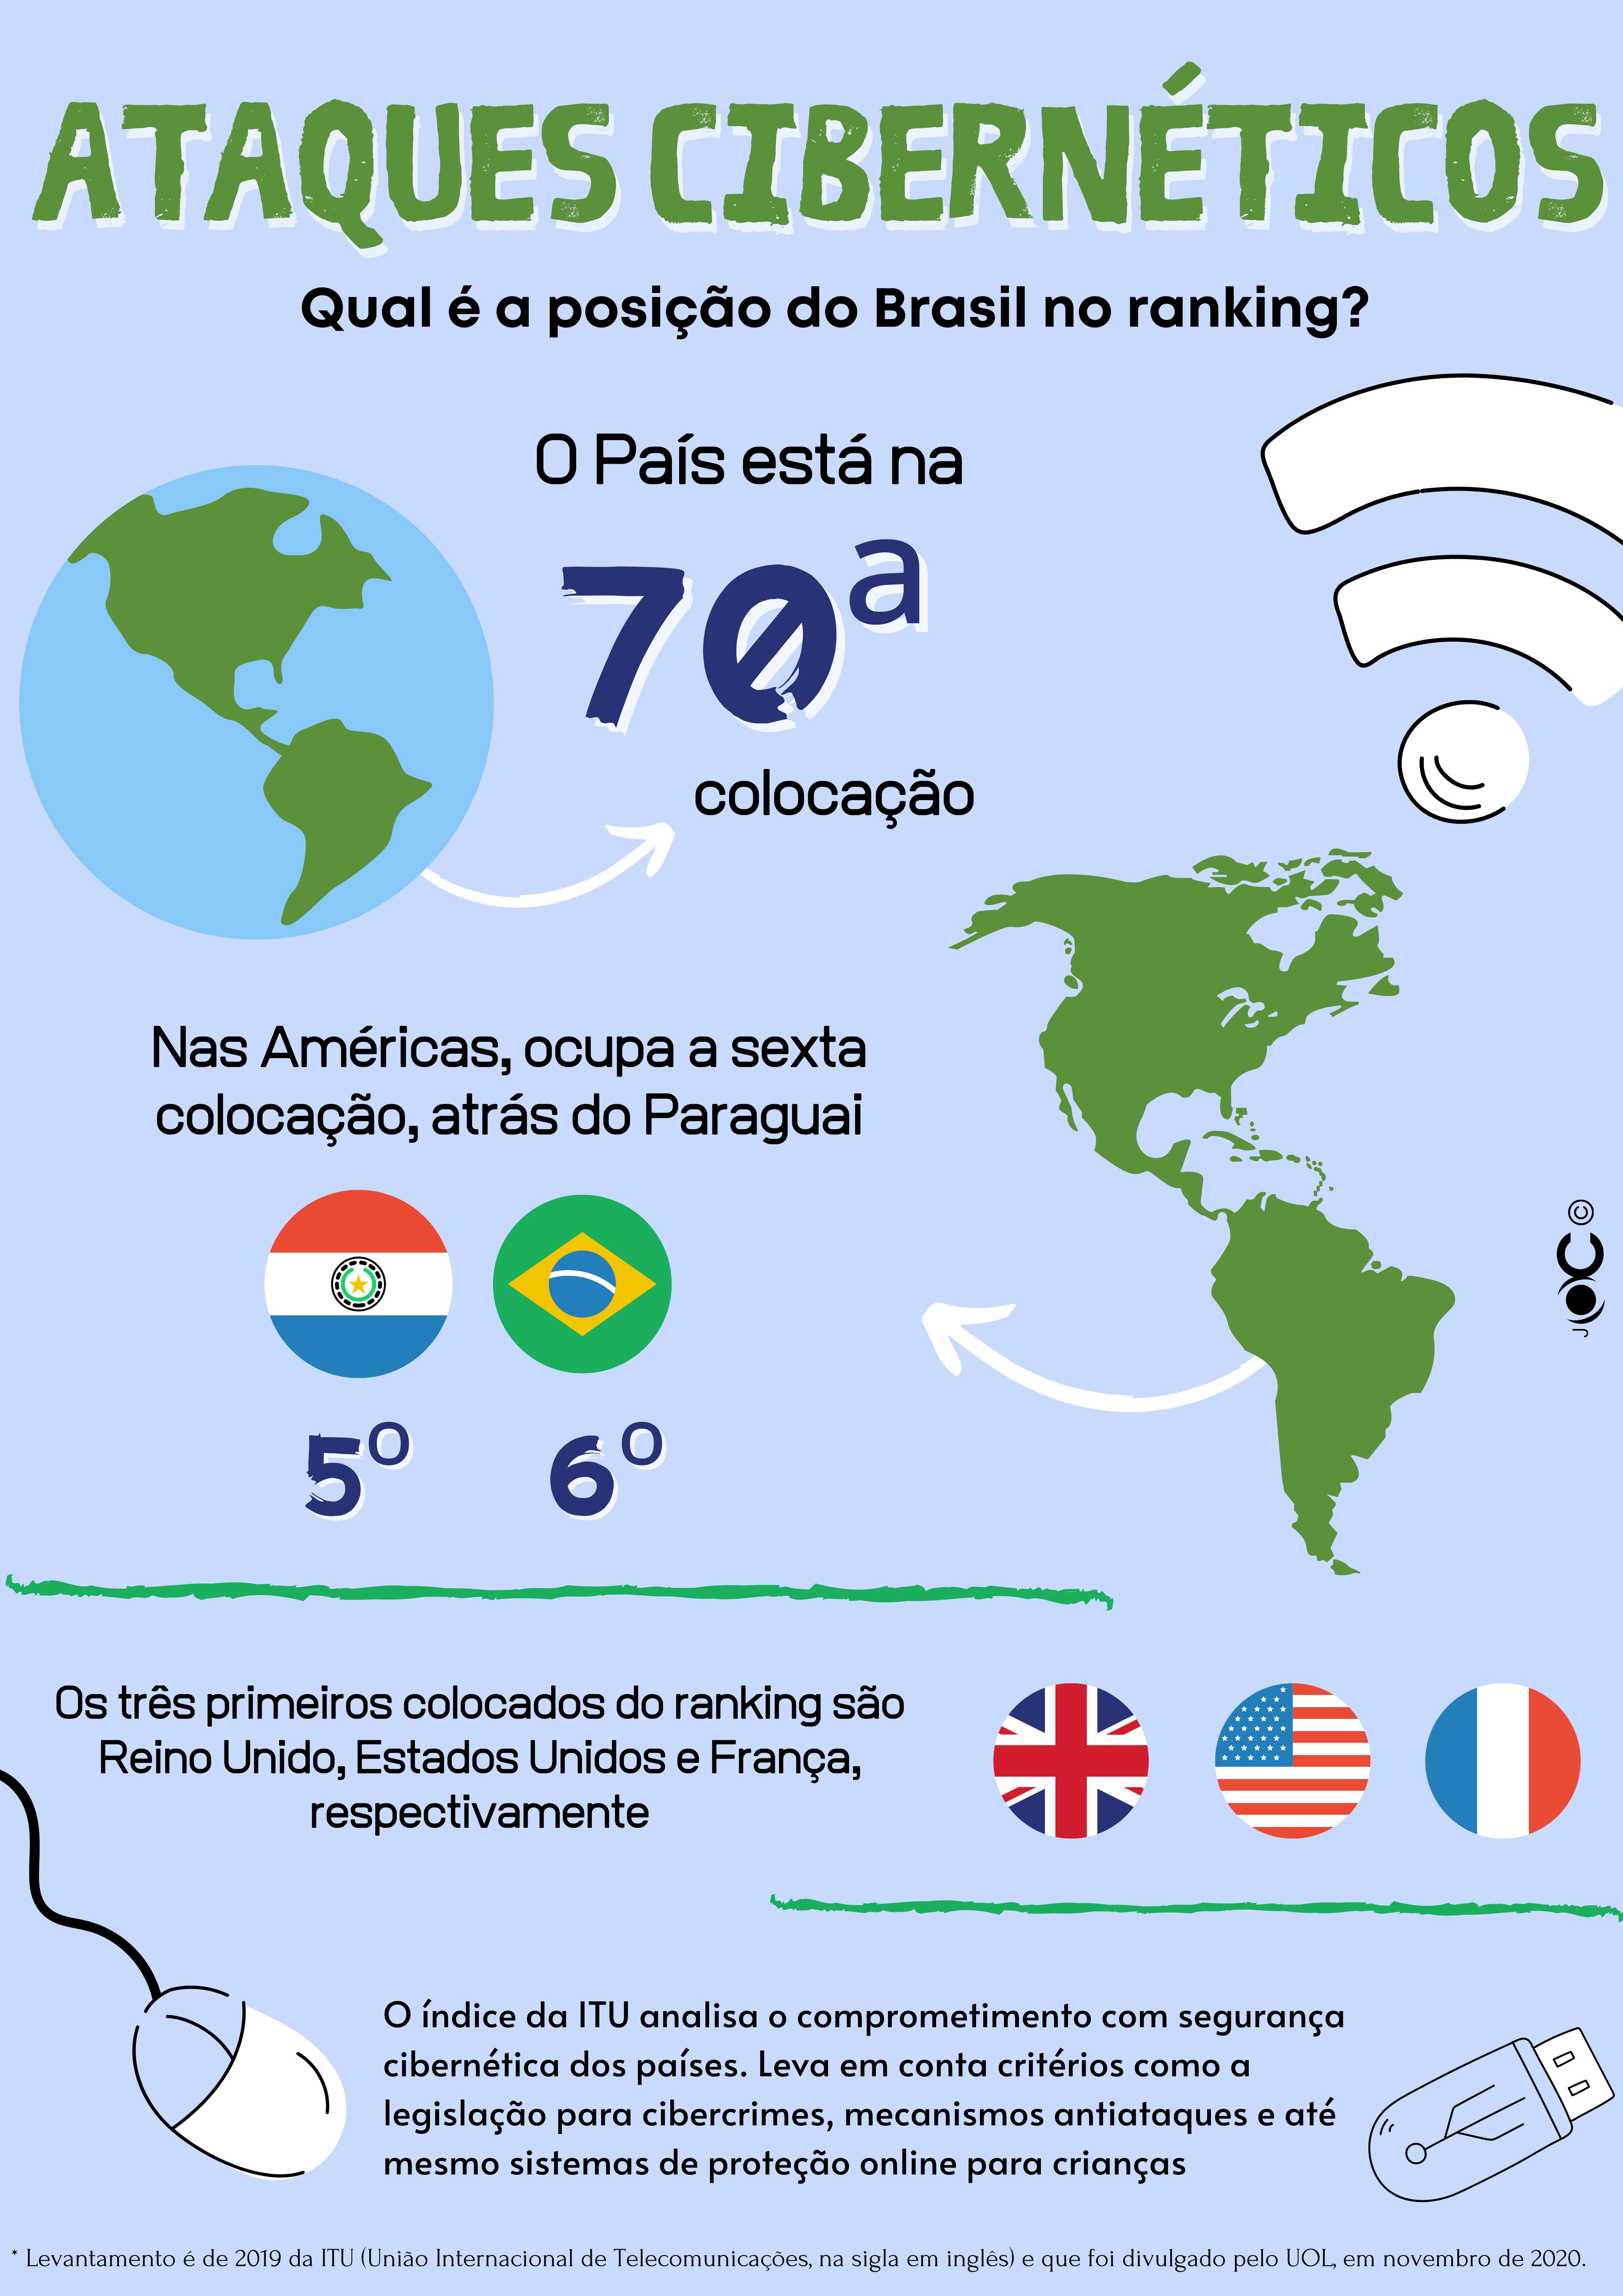 Ataque-Ciberneticos-brasil-joc